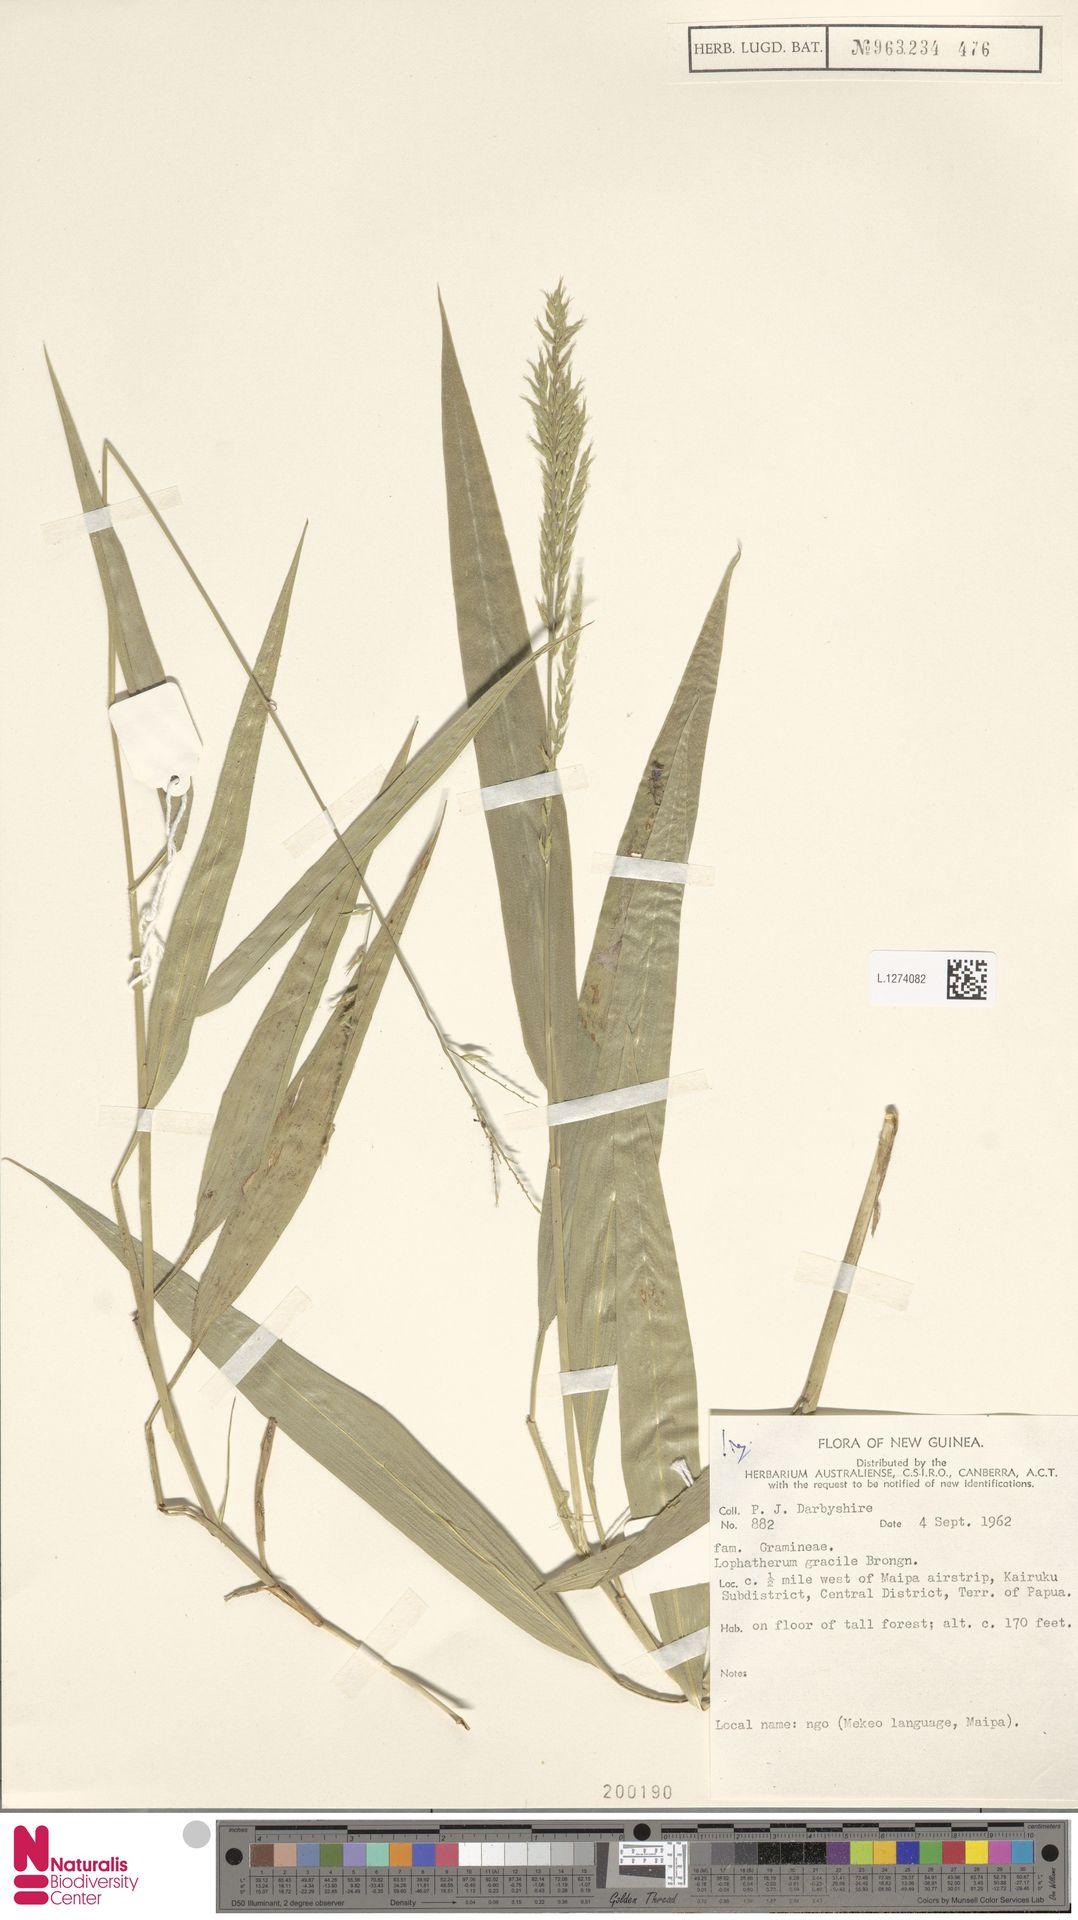 L.1274082 | Lophatherum gracile Brongn.